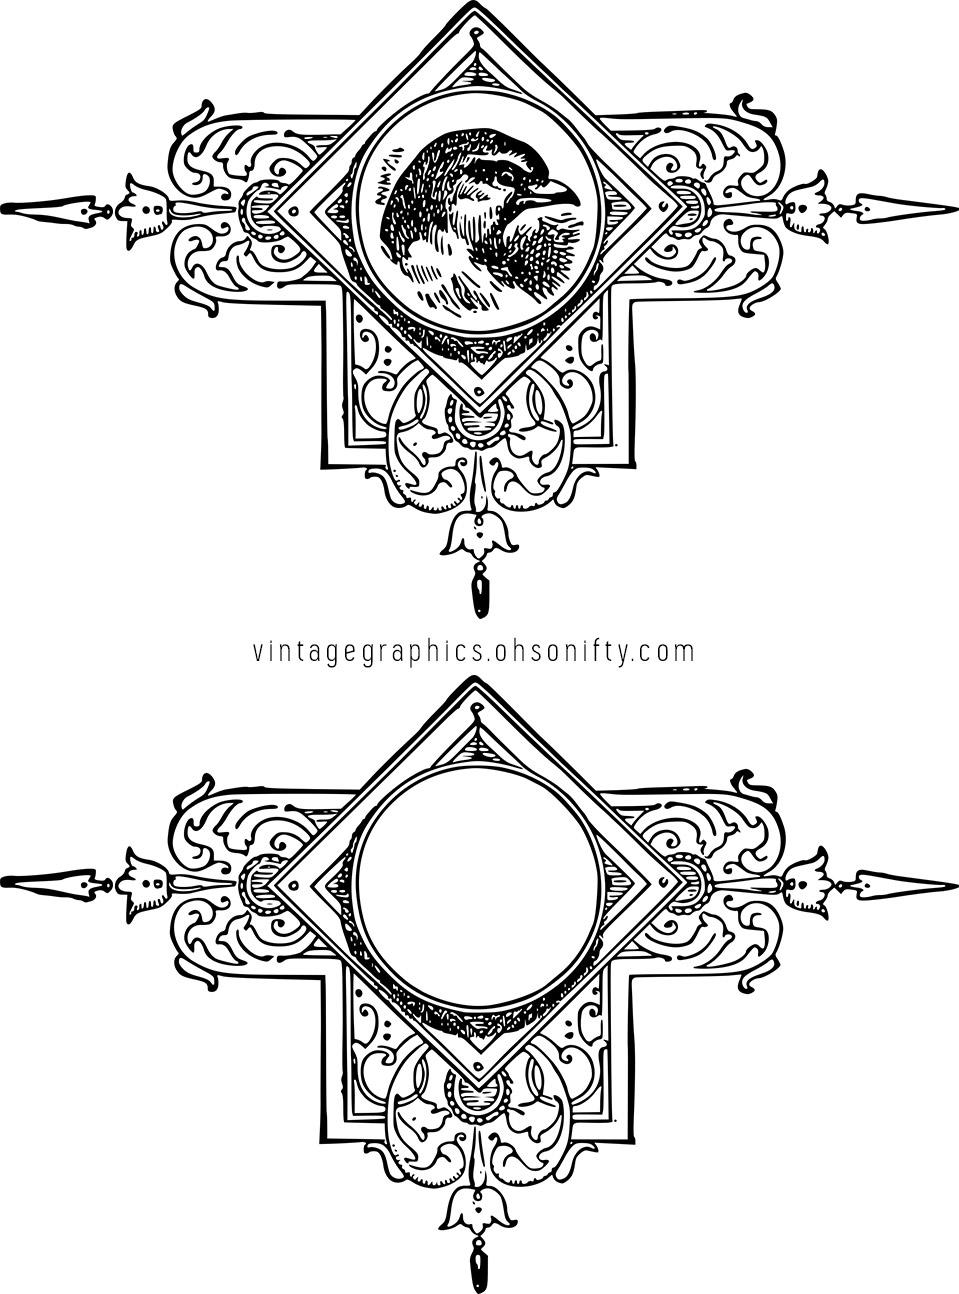 Vintage Decorative Bird Ornament Stock Vector & Clip Art